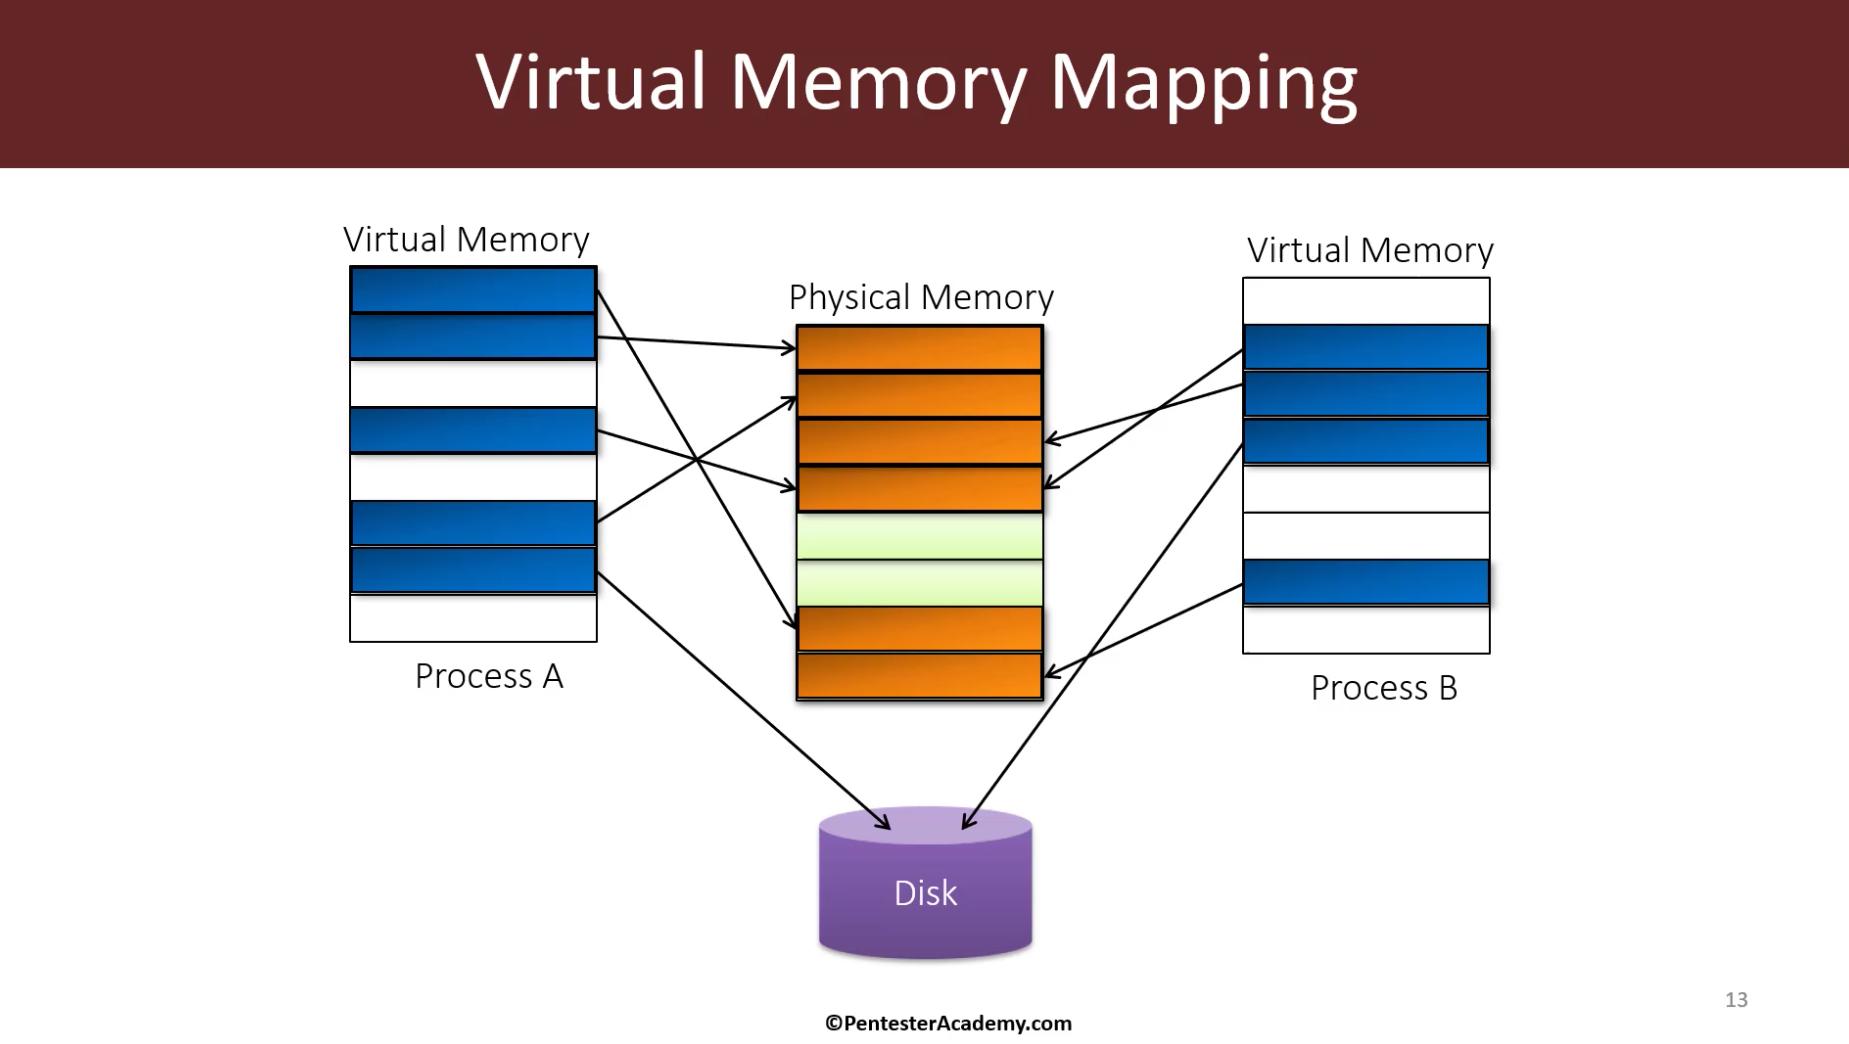 Module 1: Virtual Memory